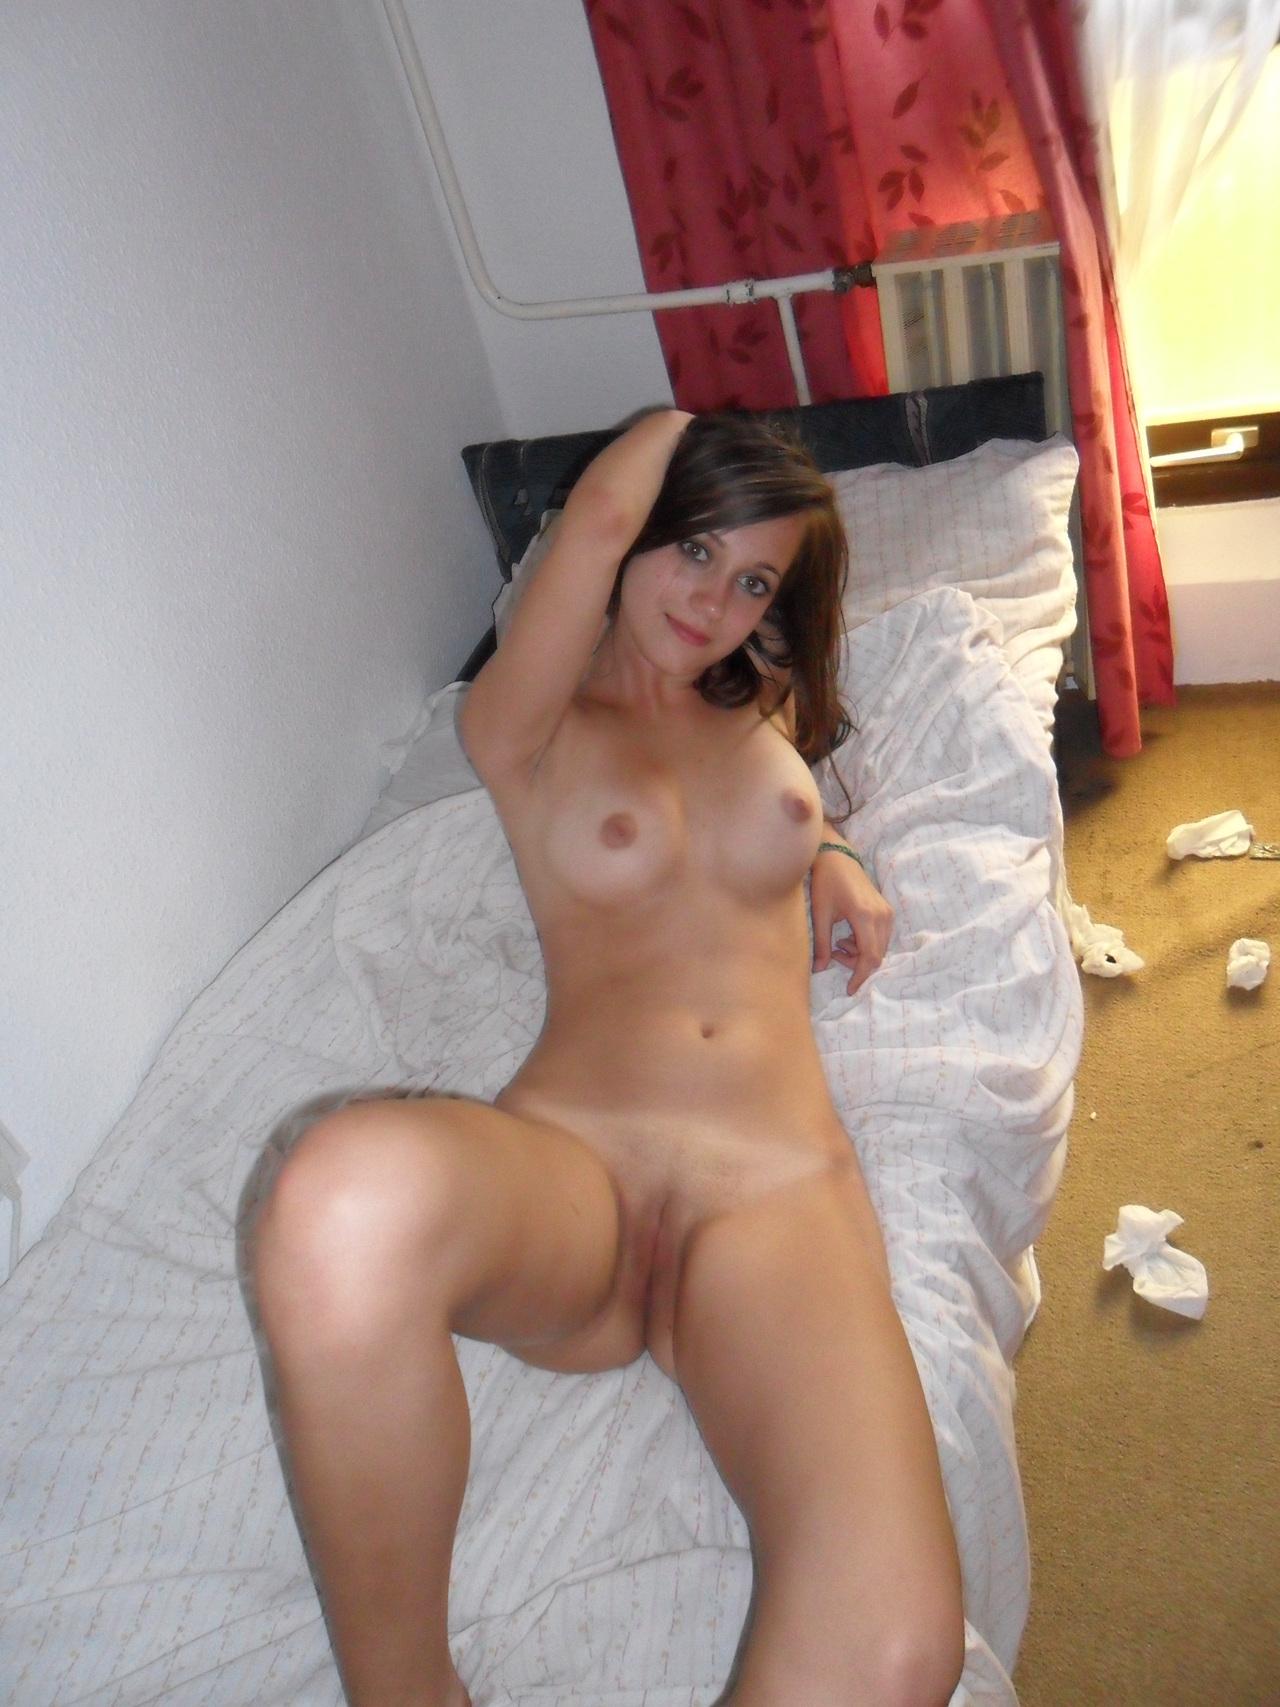 ex-girlfriend-nude-amateurs-girls-private-photo-mix-vol4-33